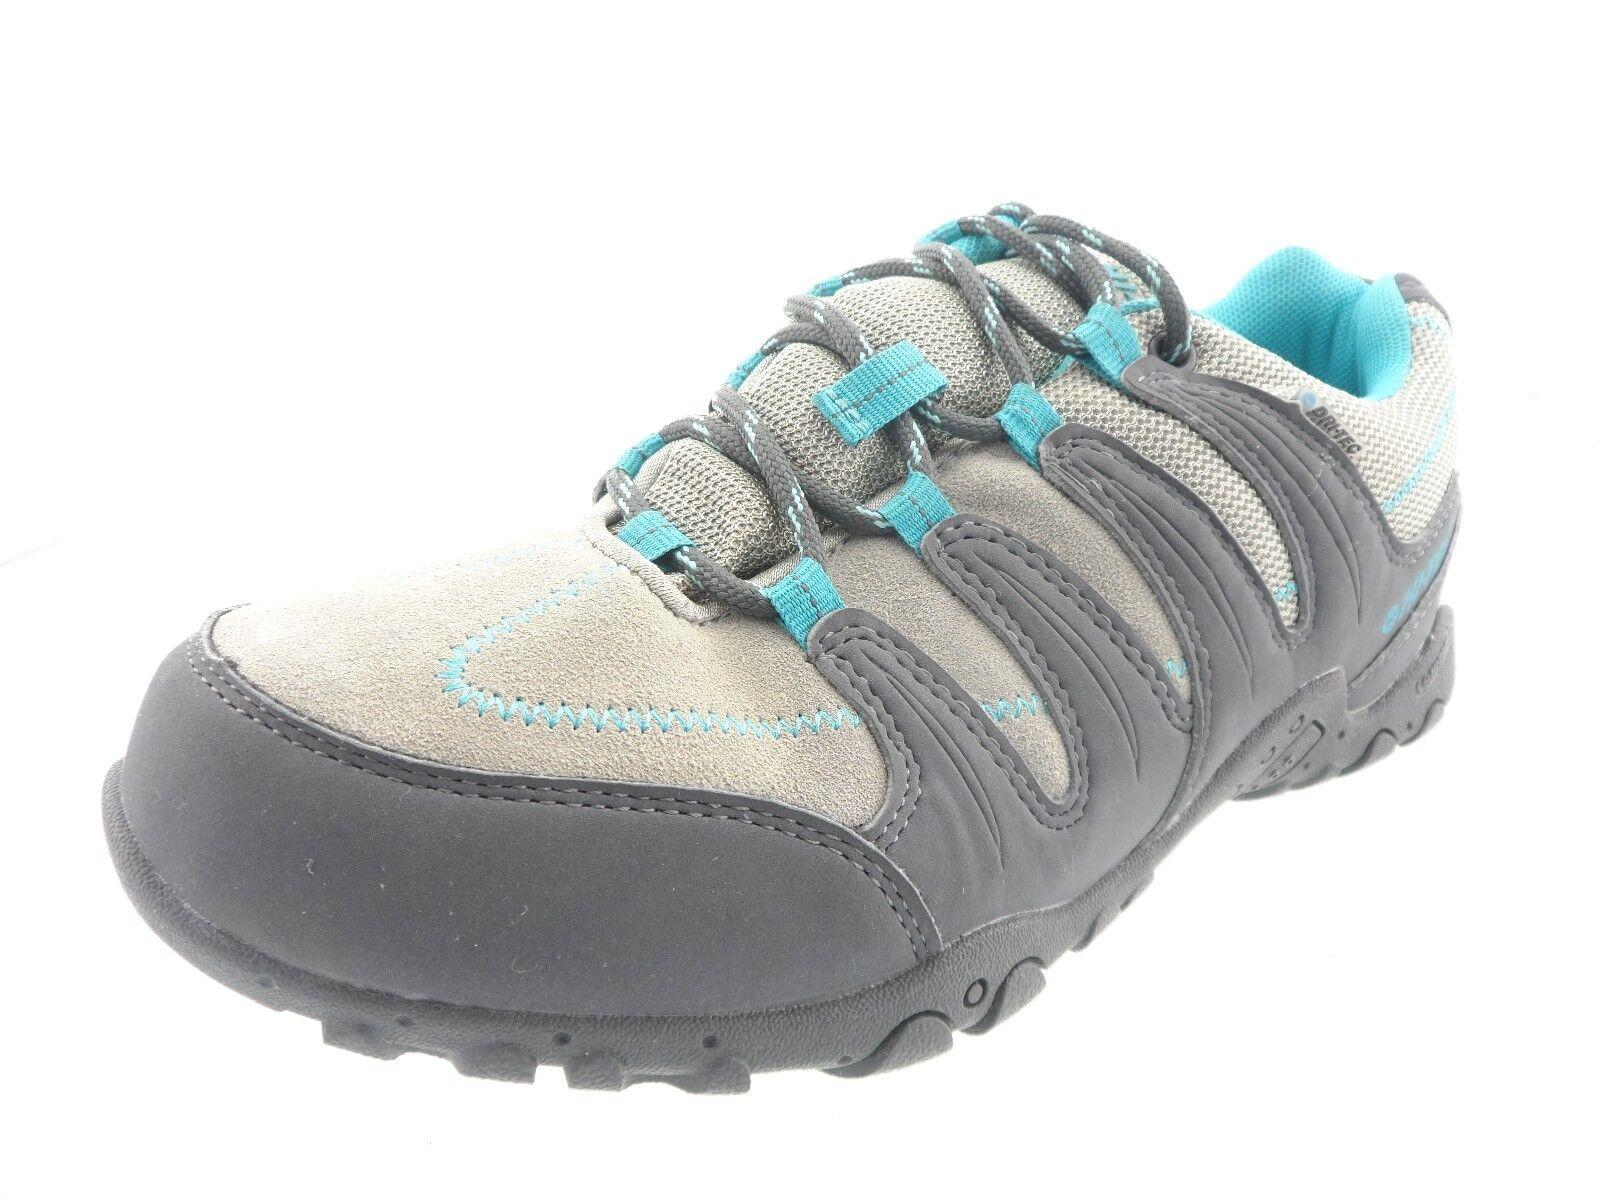 HI-TEC Women's Romsey Low WP Hiking Womens Casual Green/Grey Shoes Size 8M